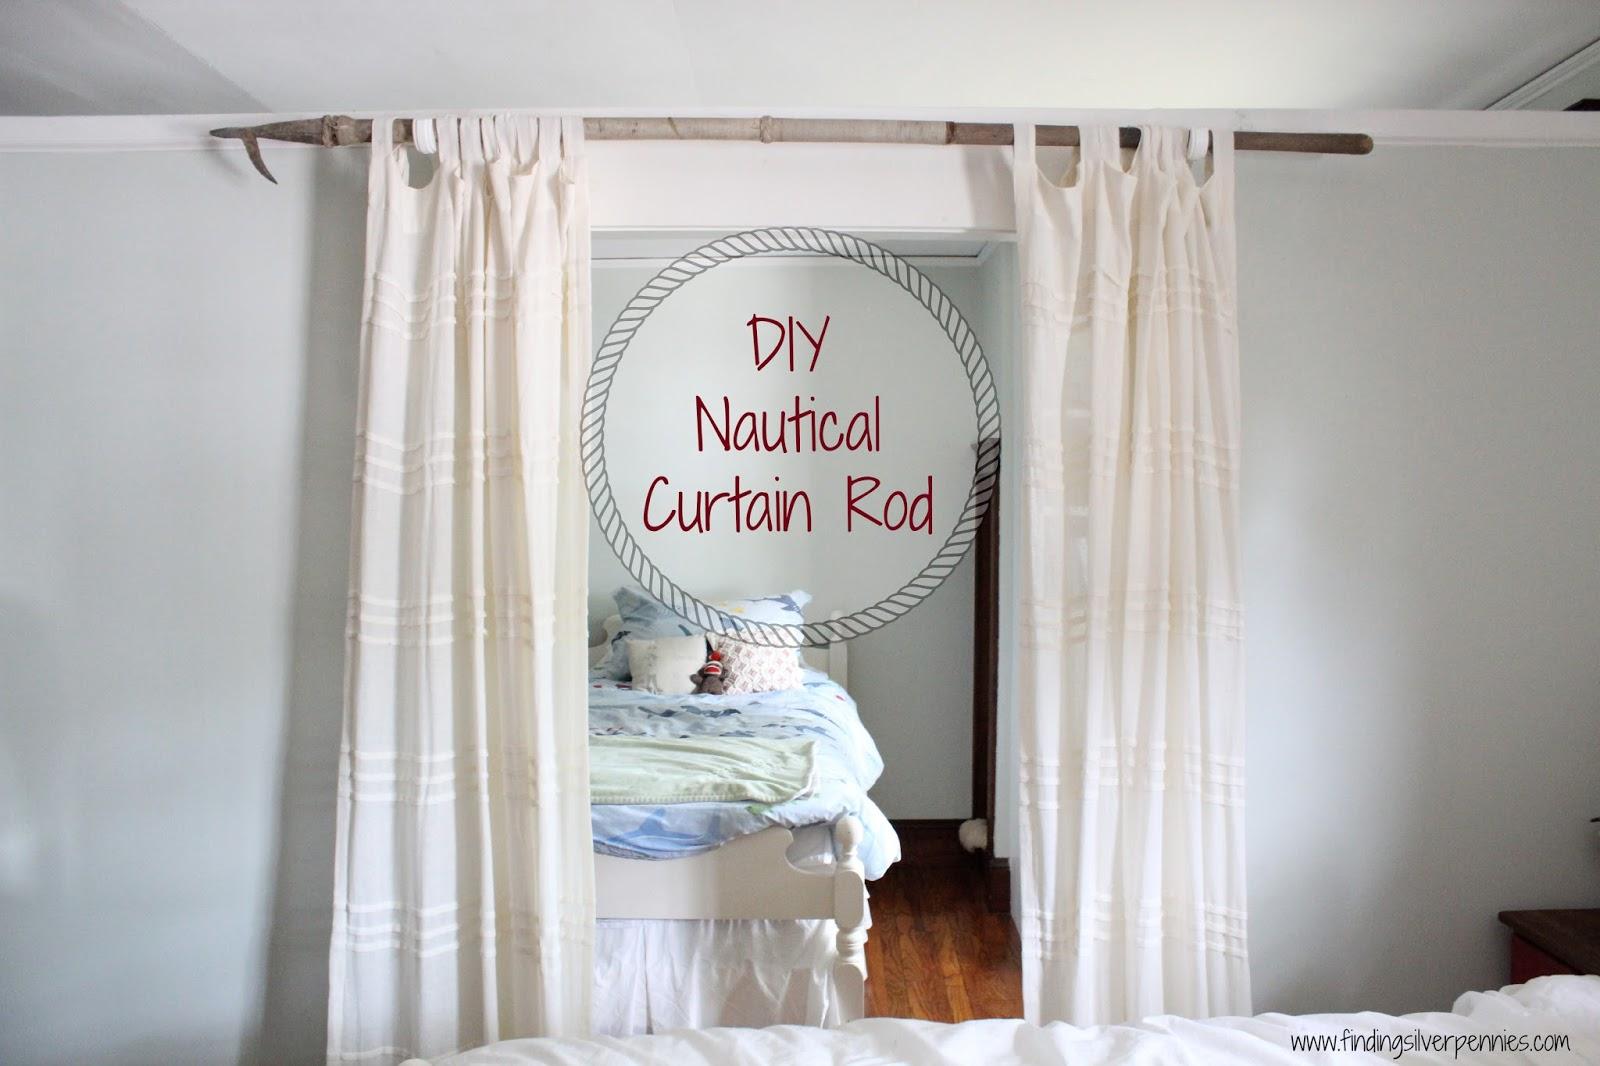 Nautical curtain rod finials - Diy Curtain Rod Finding Silver Pennies